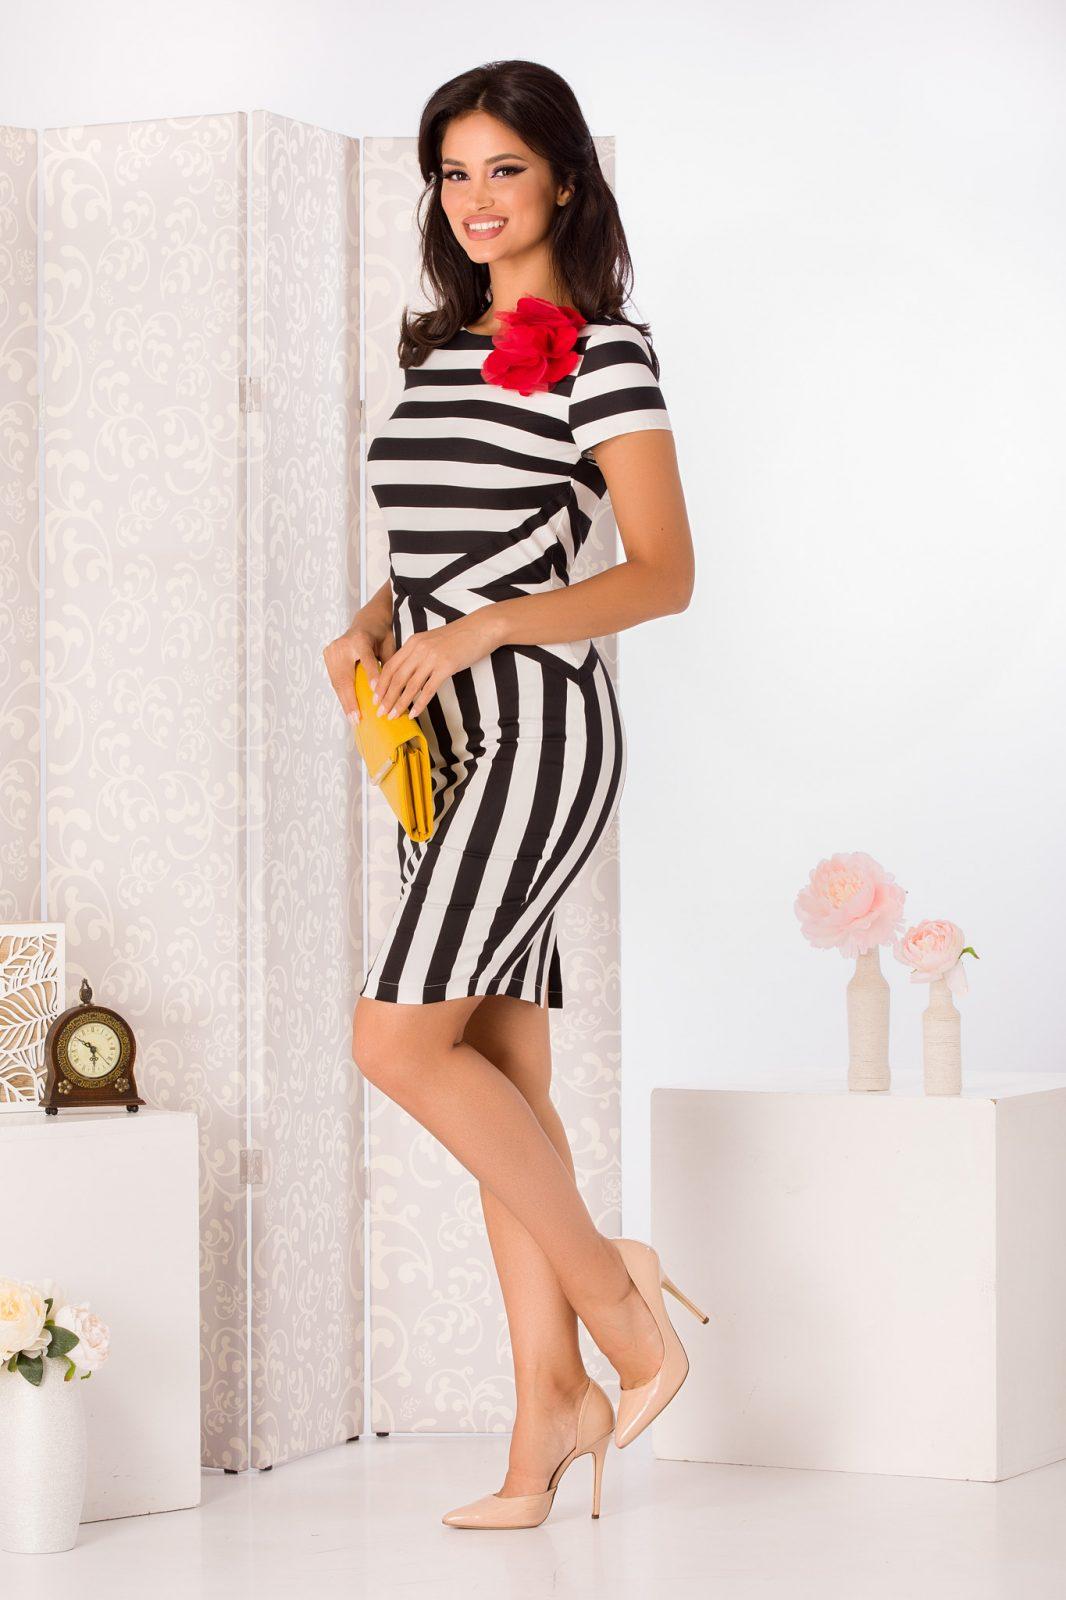 La Donna Mathilde Ριγέ Φόρεμα 4968